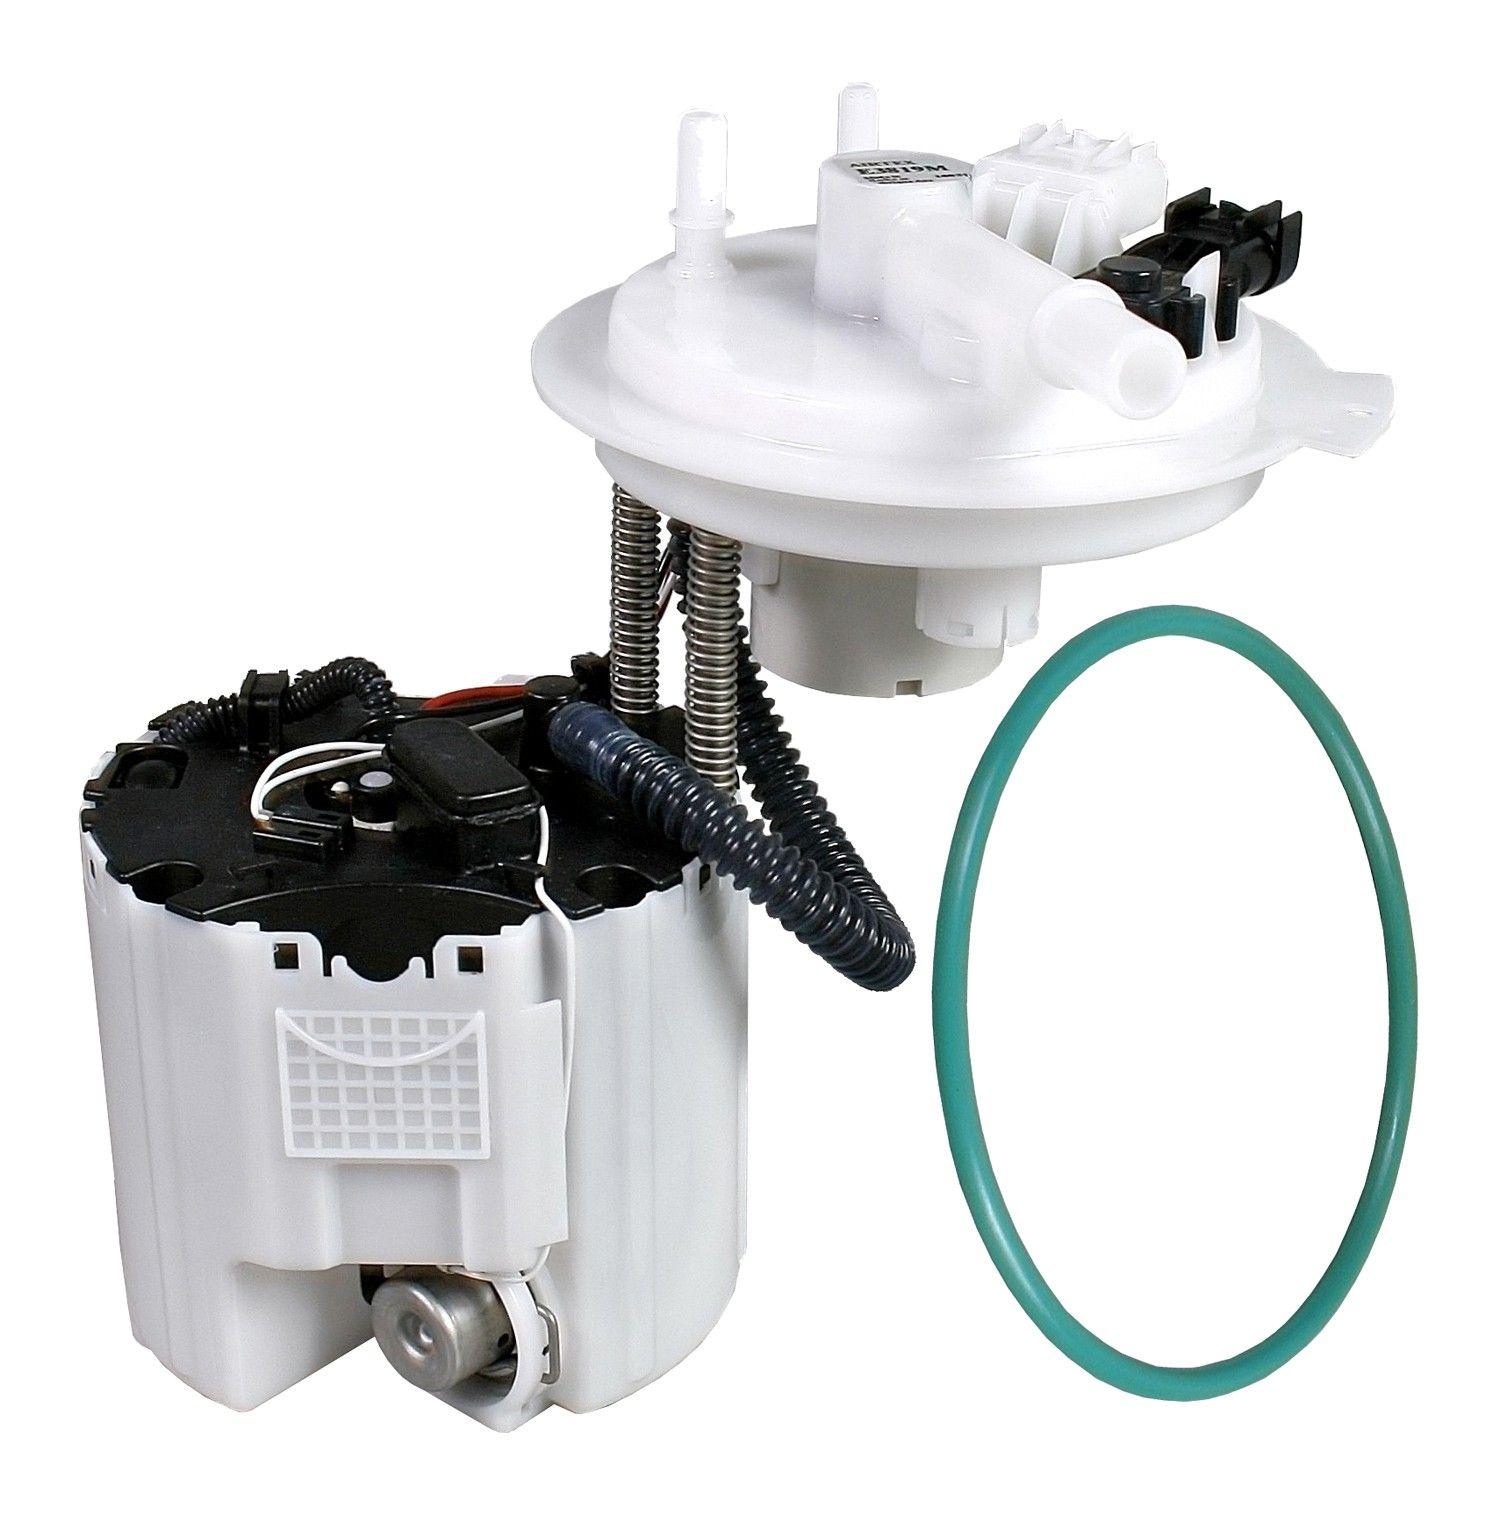 Chevrolet Malibu Fuel Pump Module Assembly Replacement